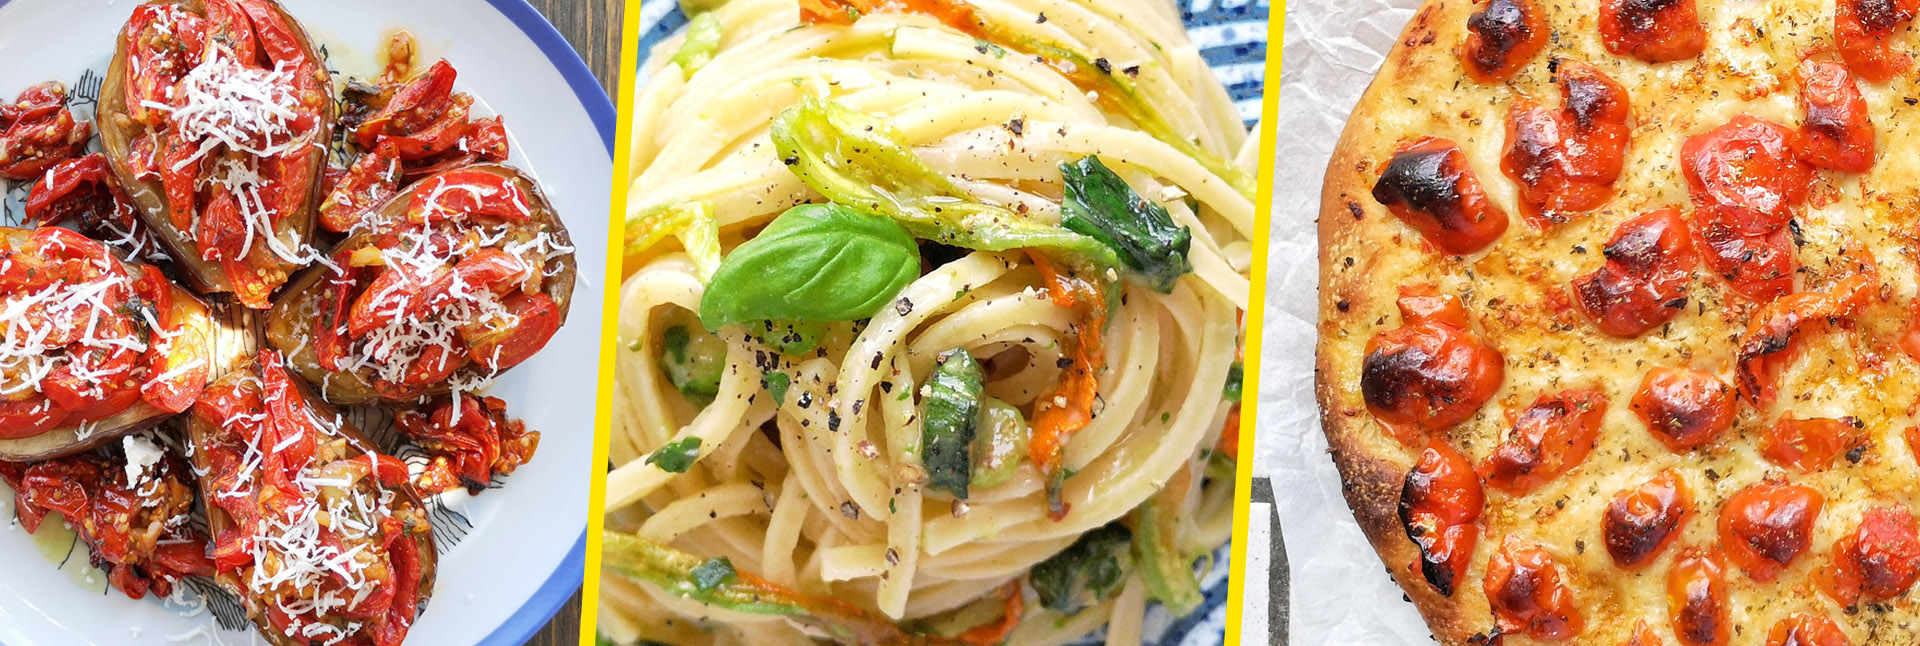 Le ricette per l'estate in cucina